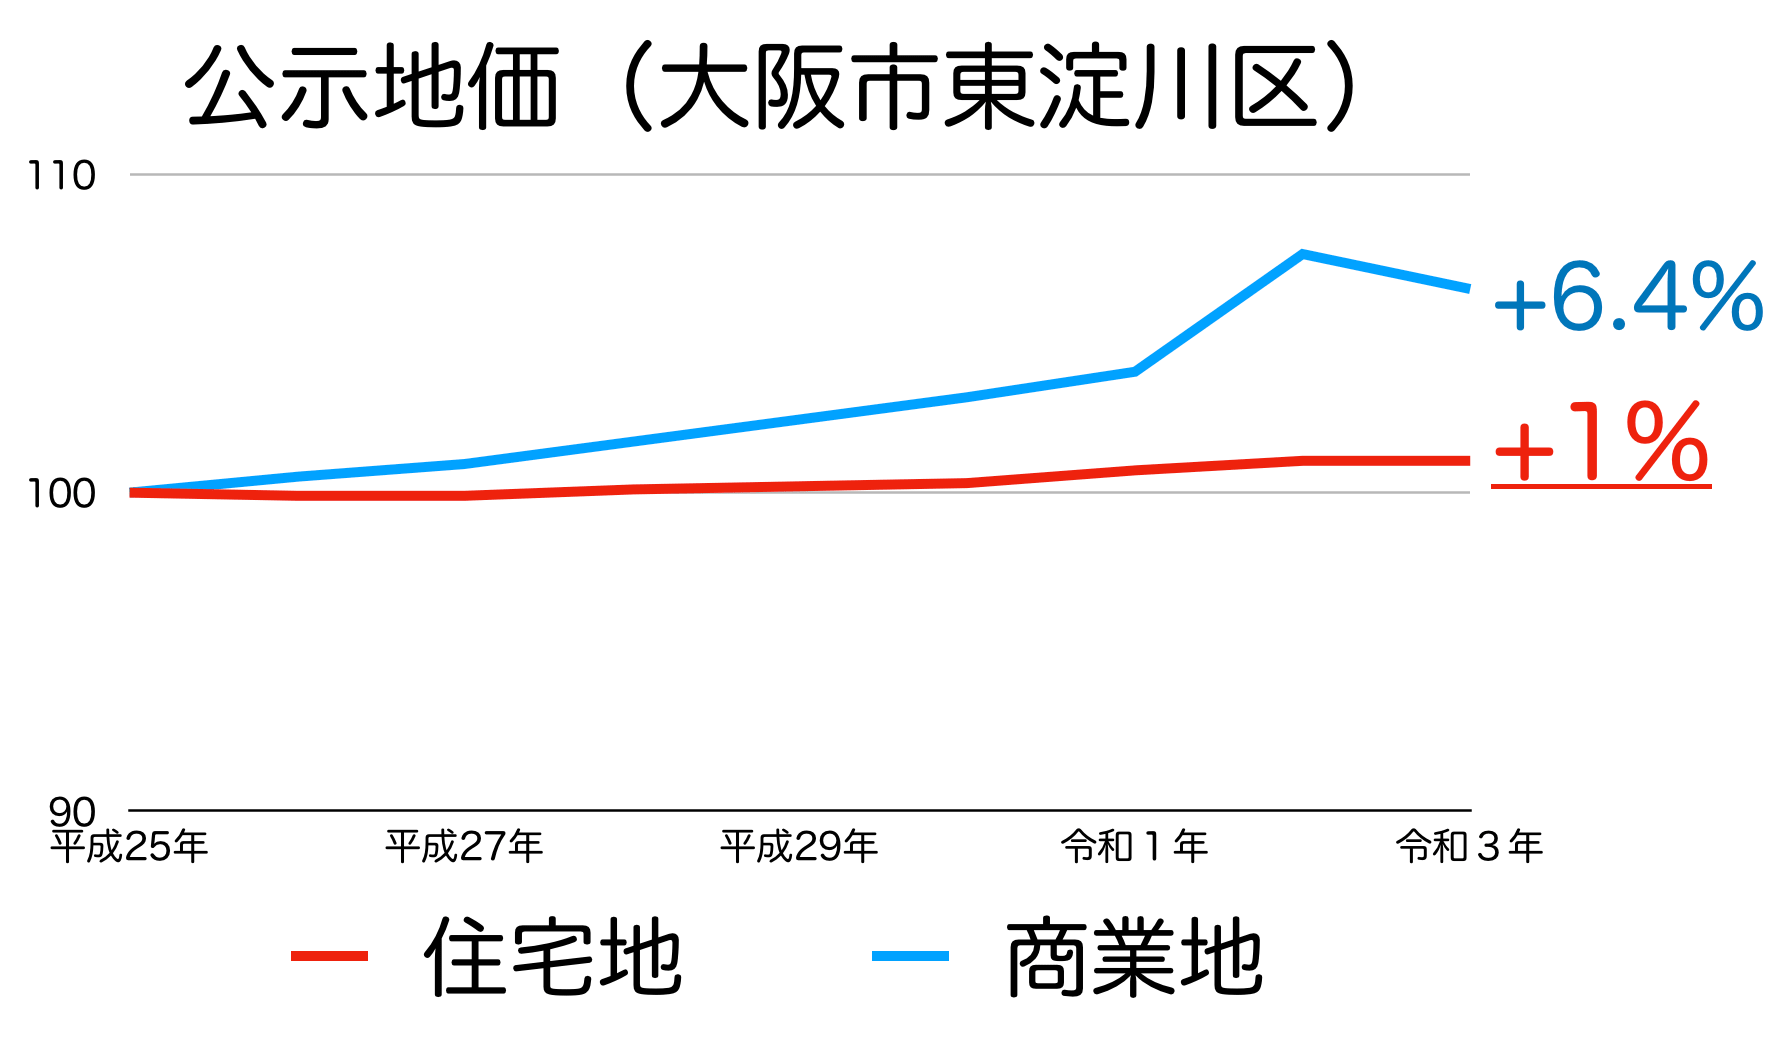 大阪市東淀川区の公示地価の推移